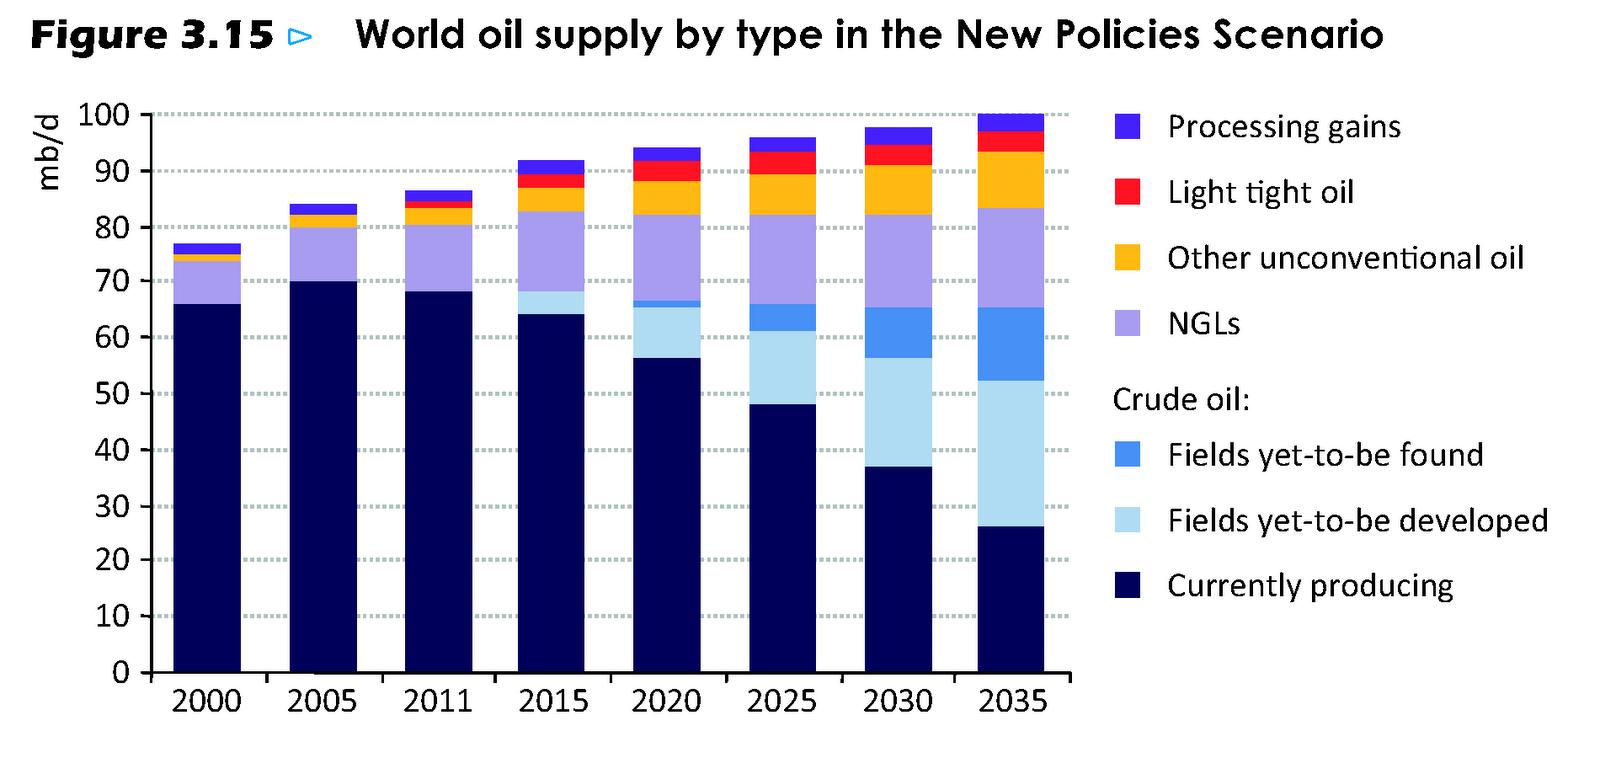 iea-forecast-of-us-oil-production-new-policies-scenario